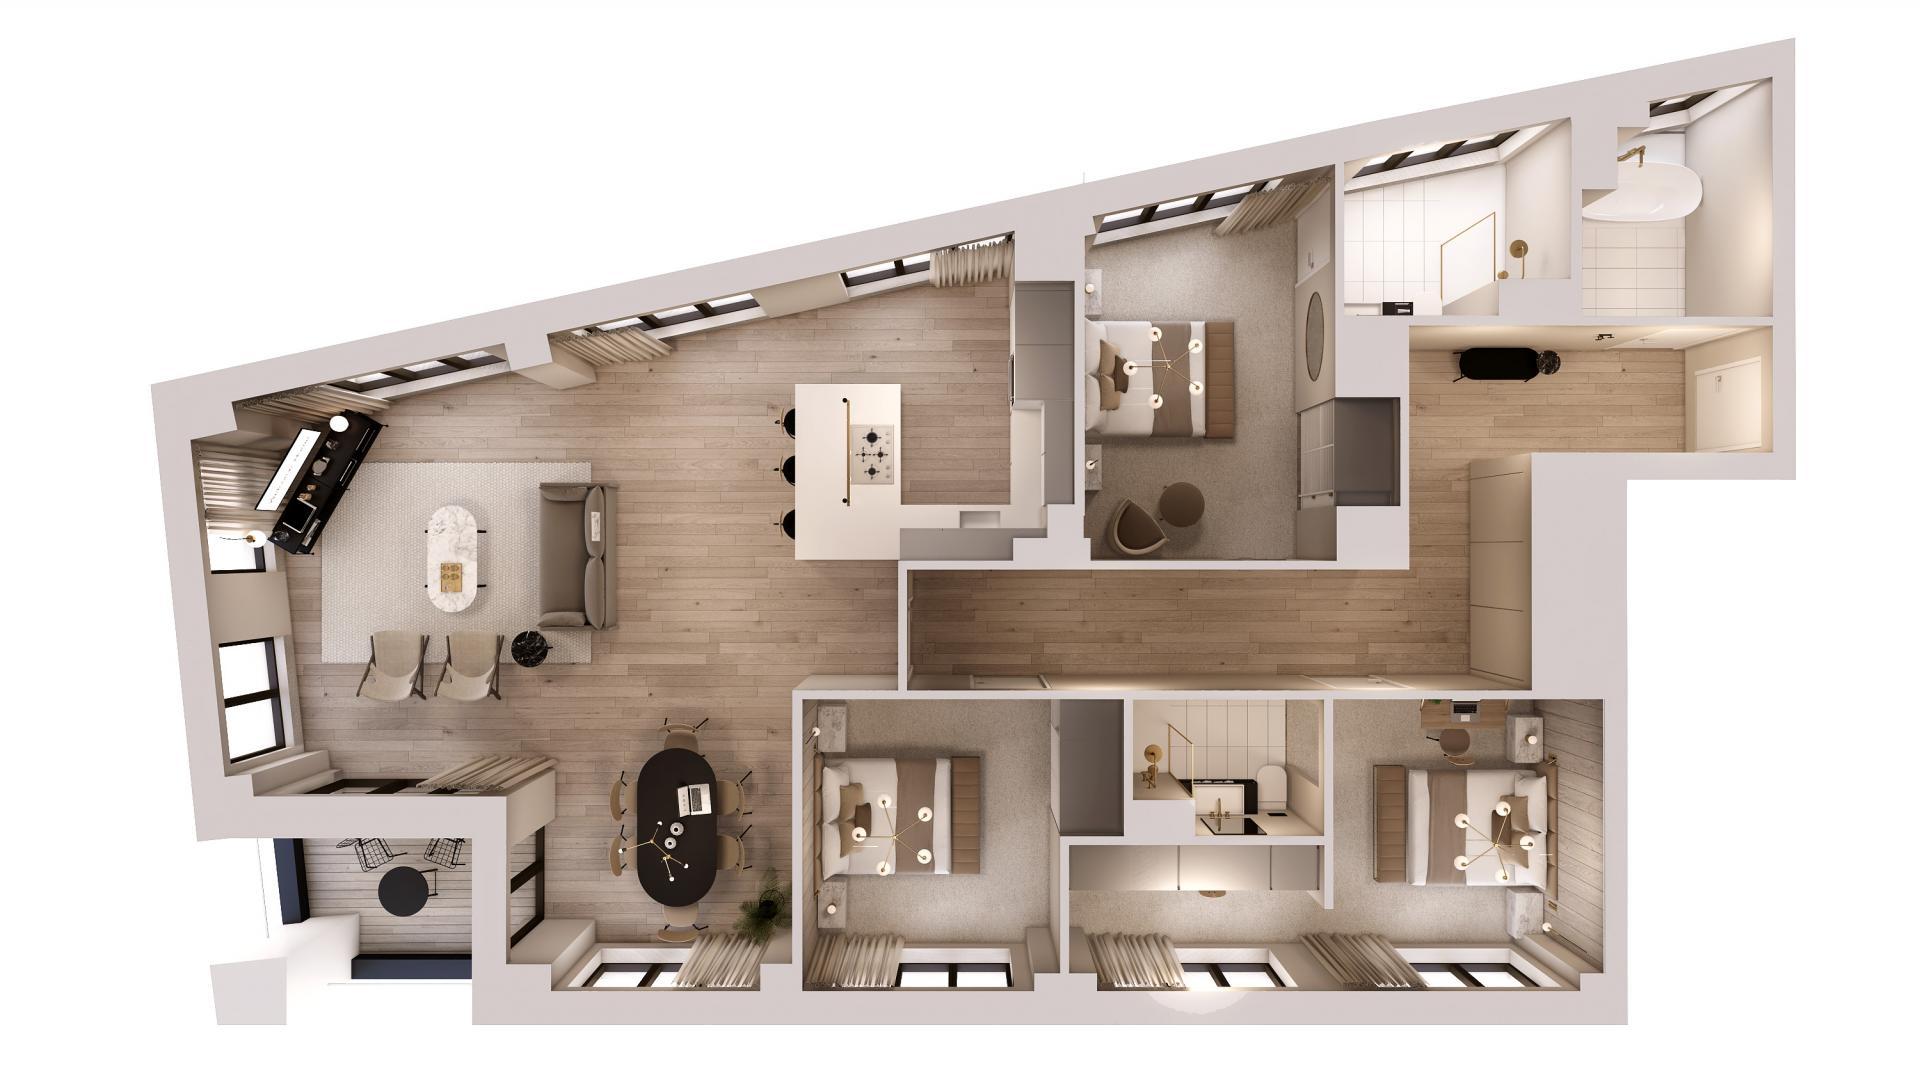 3 bed 3 bath floor plan at STAY Camden Serviced Apartments, Camden, London